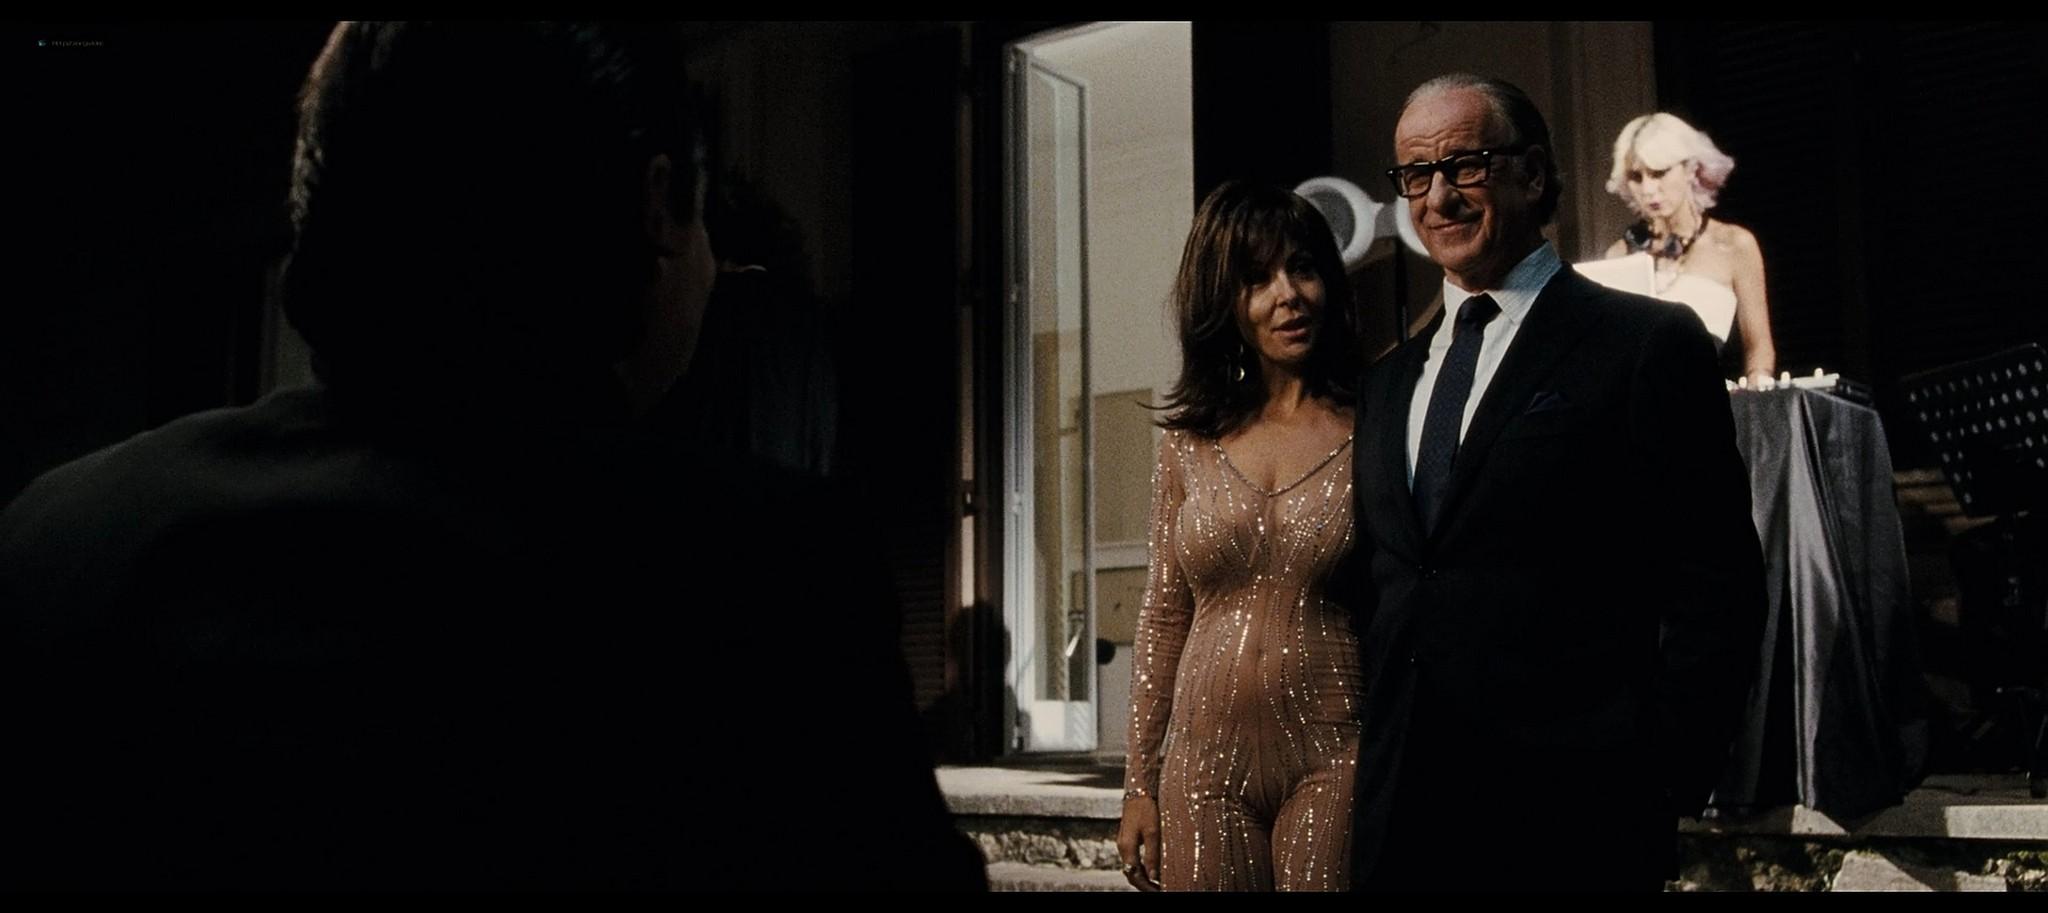 Sabrina Ferilli nude Anita Kravos full frontal Galatea Ranzi and others nude and sexy The Great Beauty IT 2013 1080p BluRey 17